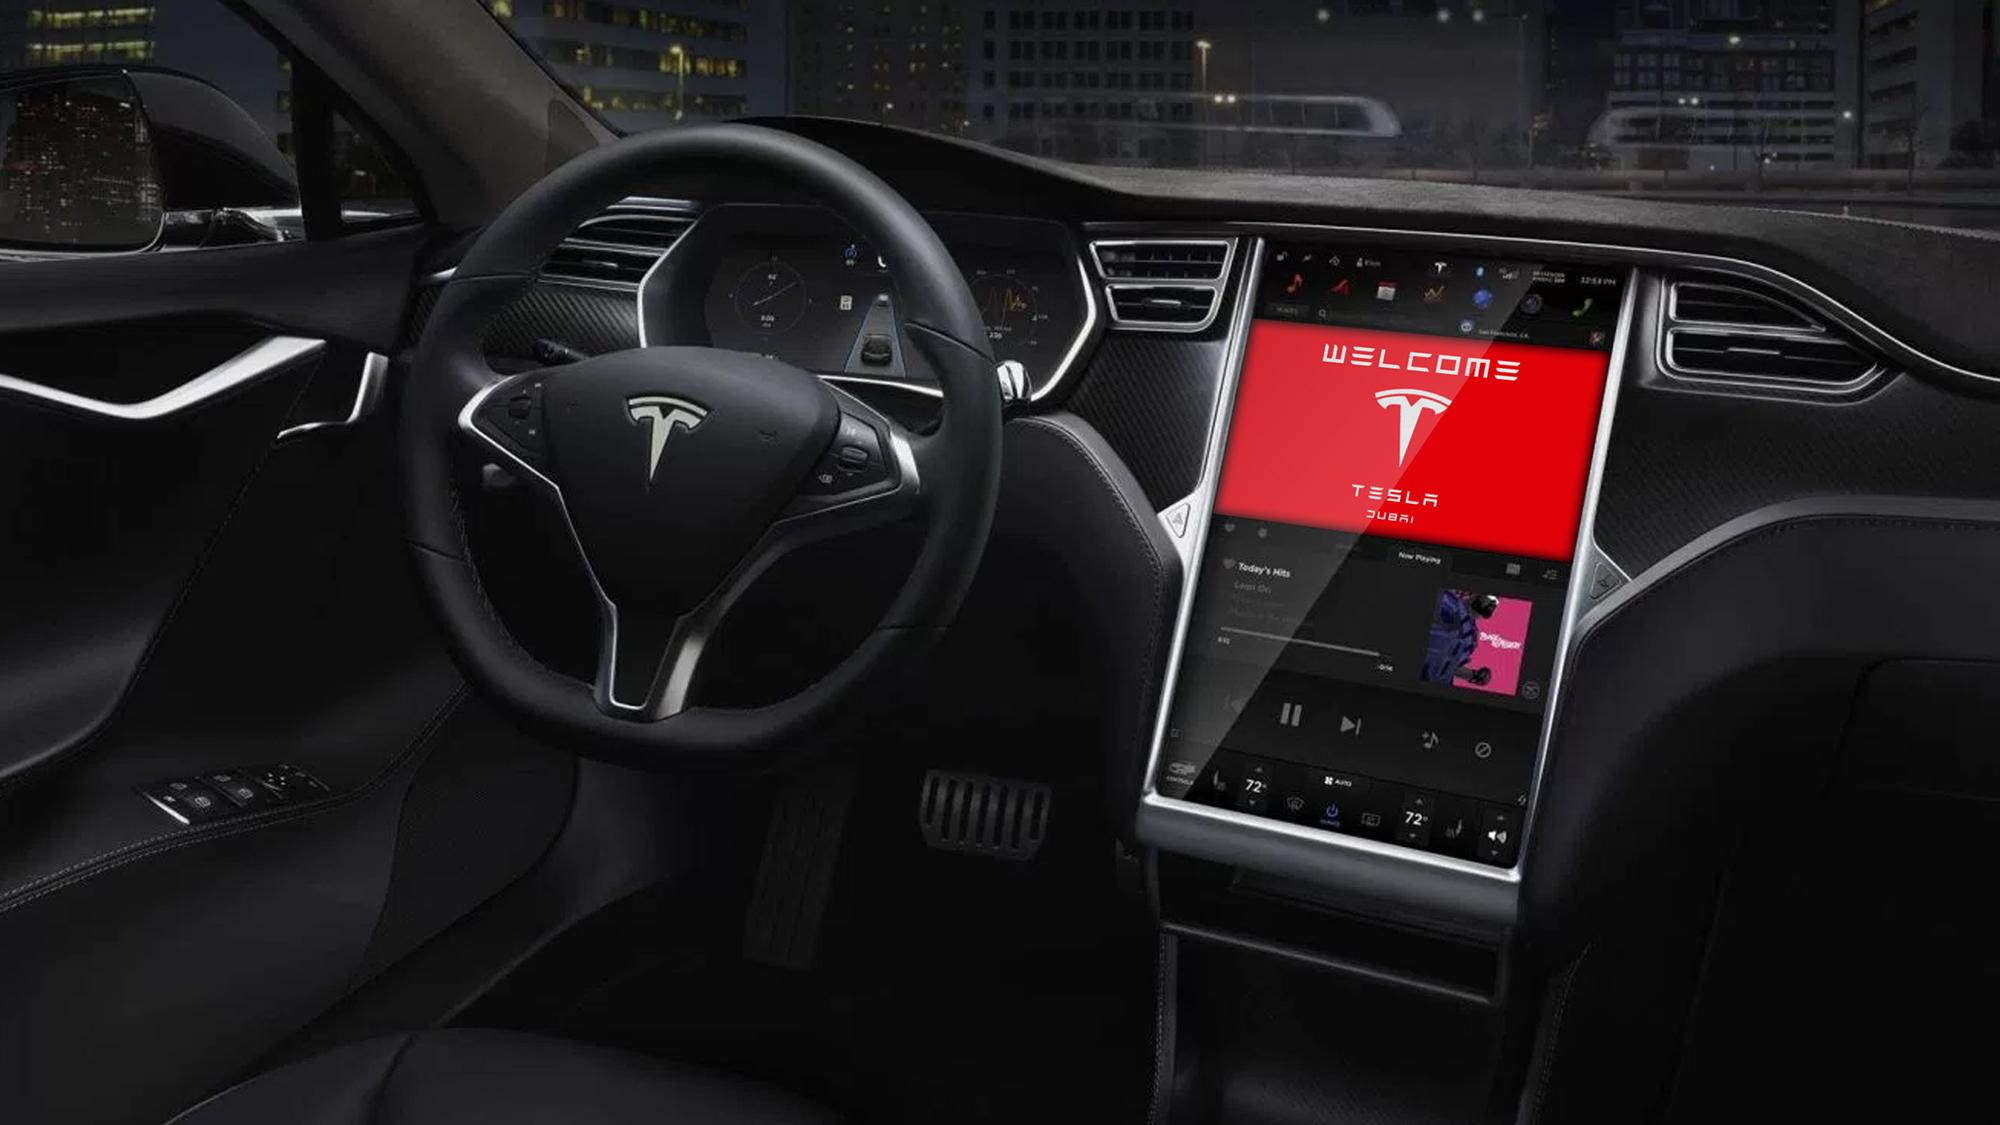 Tesla-font7.jpg